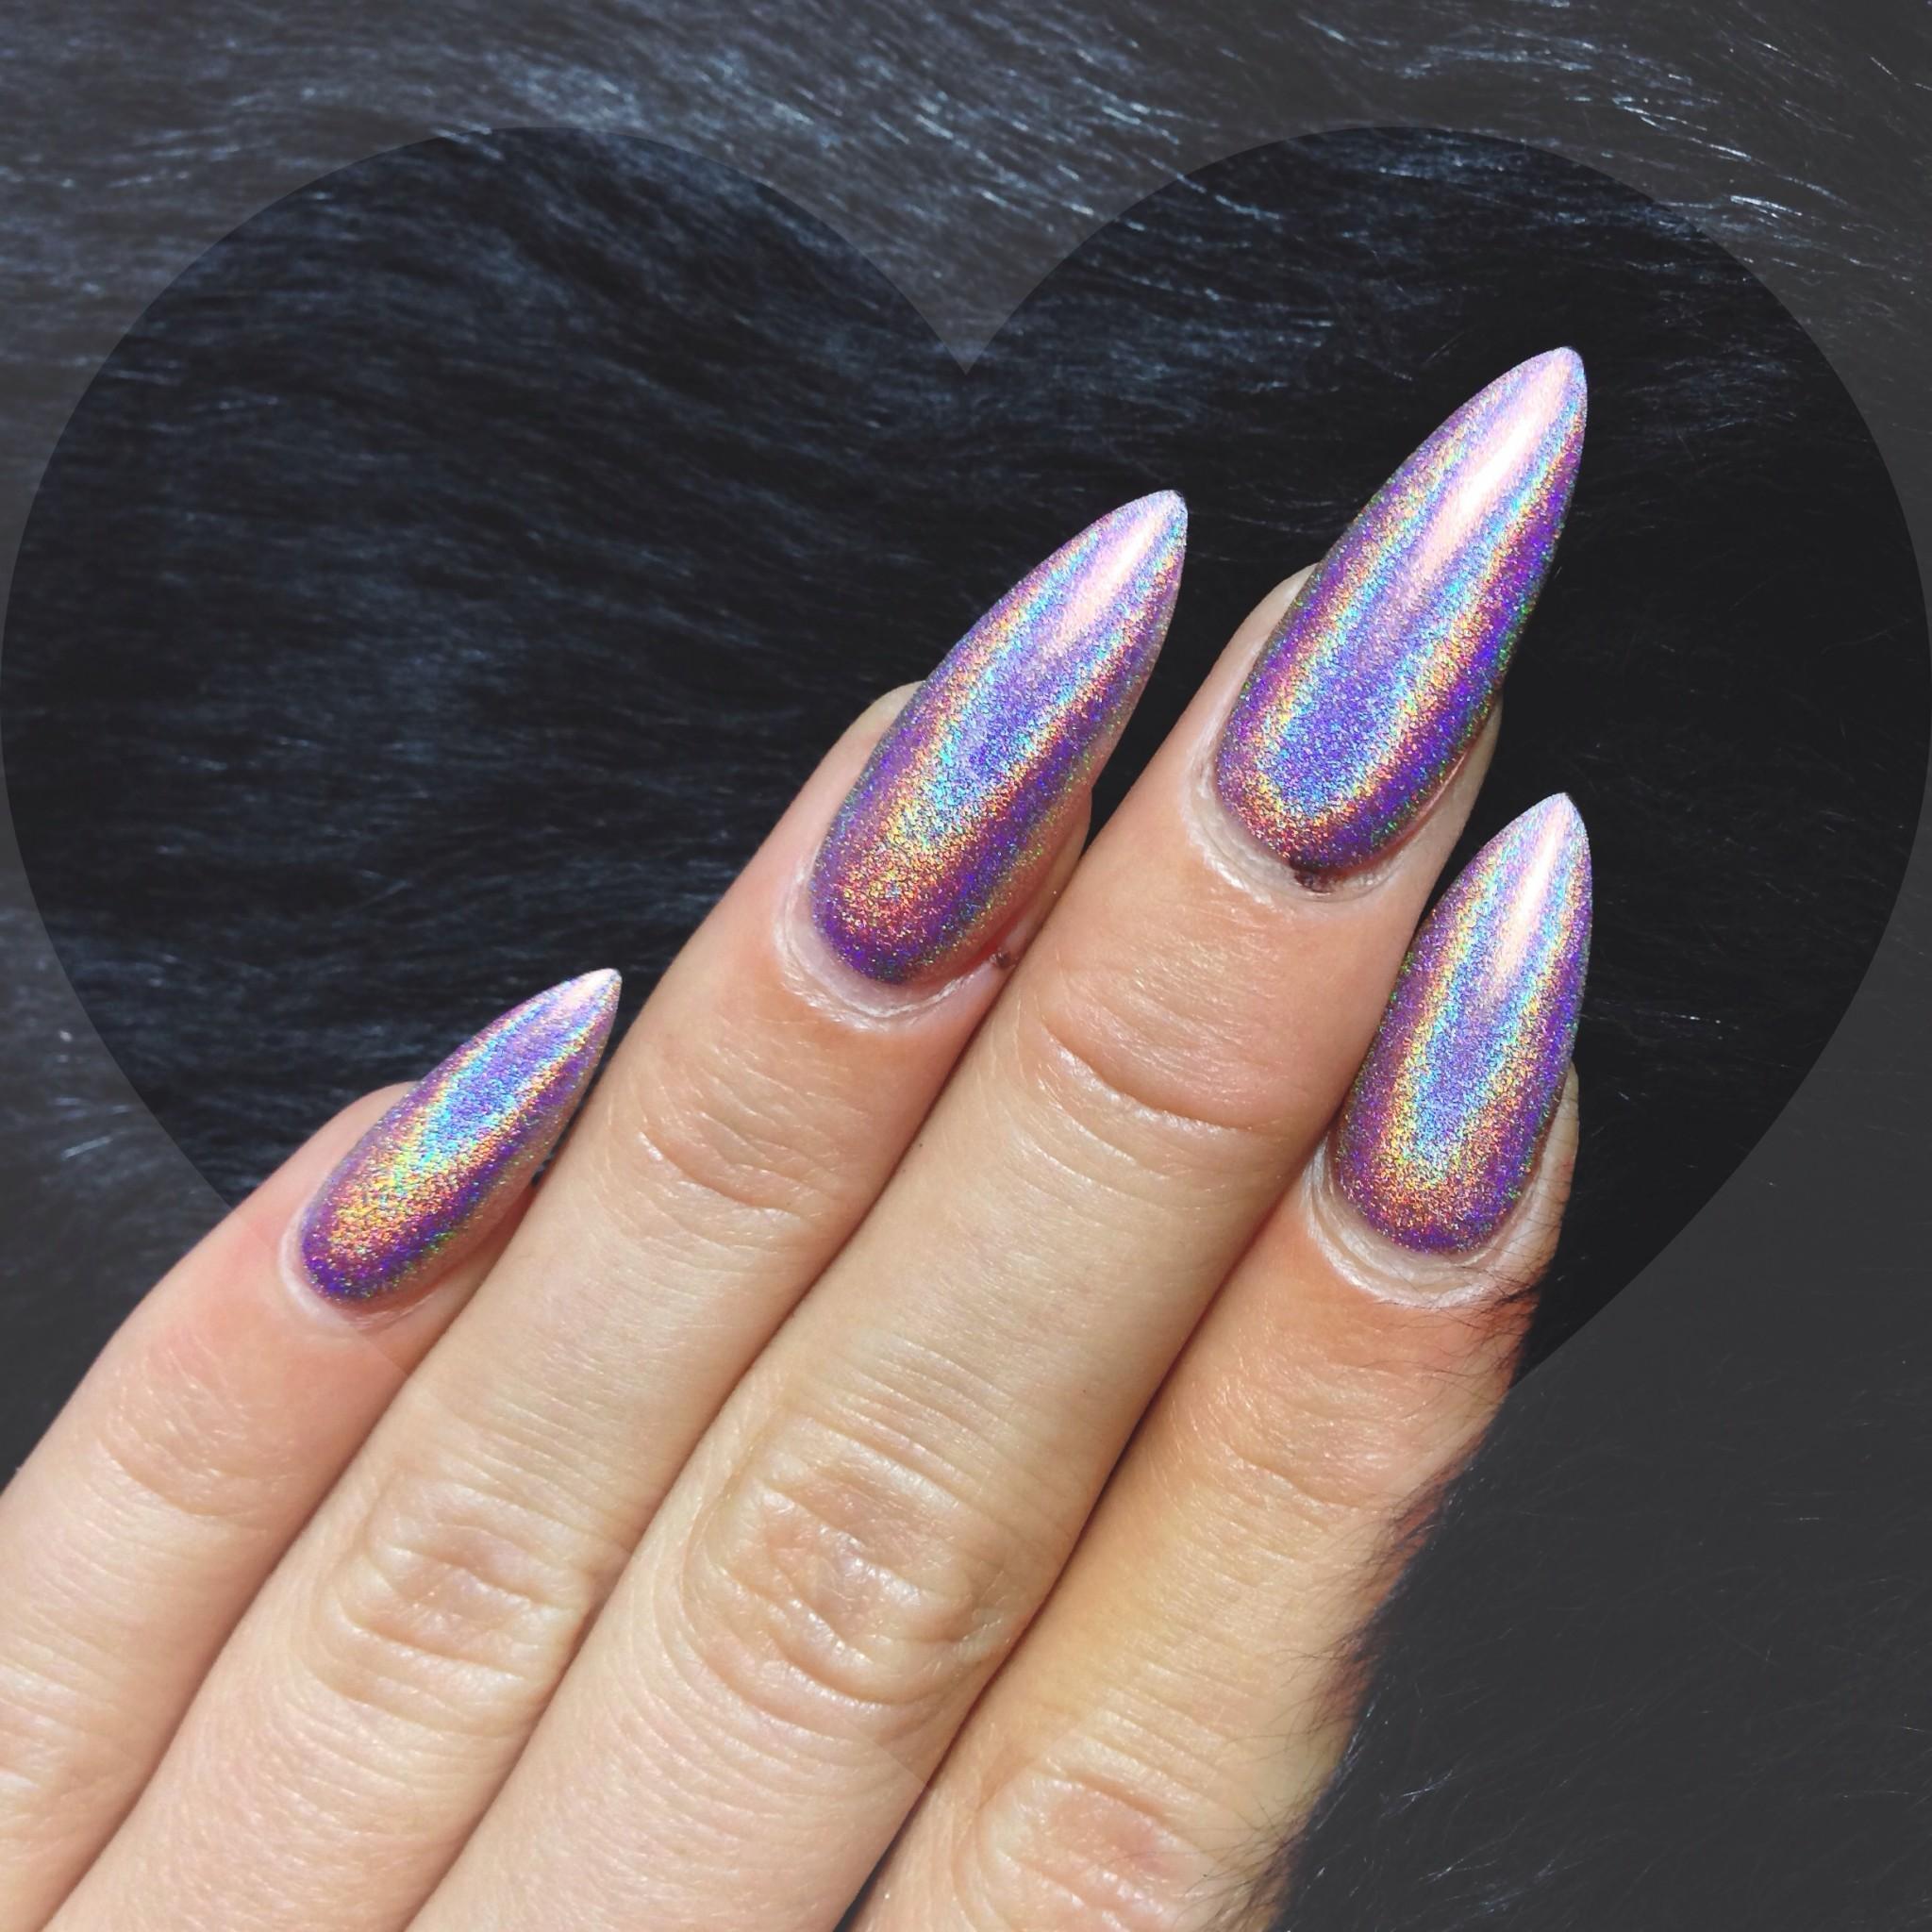 23-pics-of-holographic-nail-designs.jpg